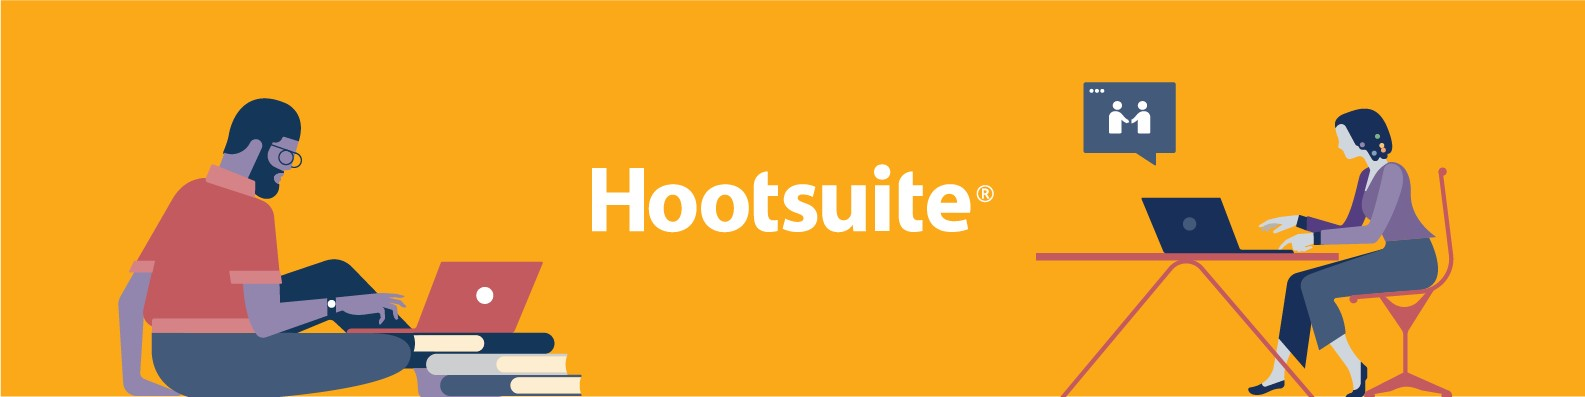 Hootsuite | LinkedIn